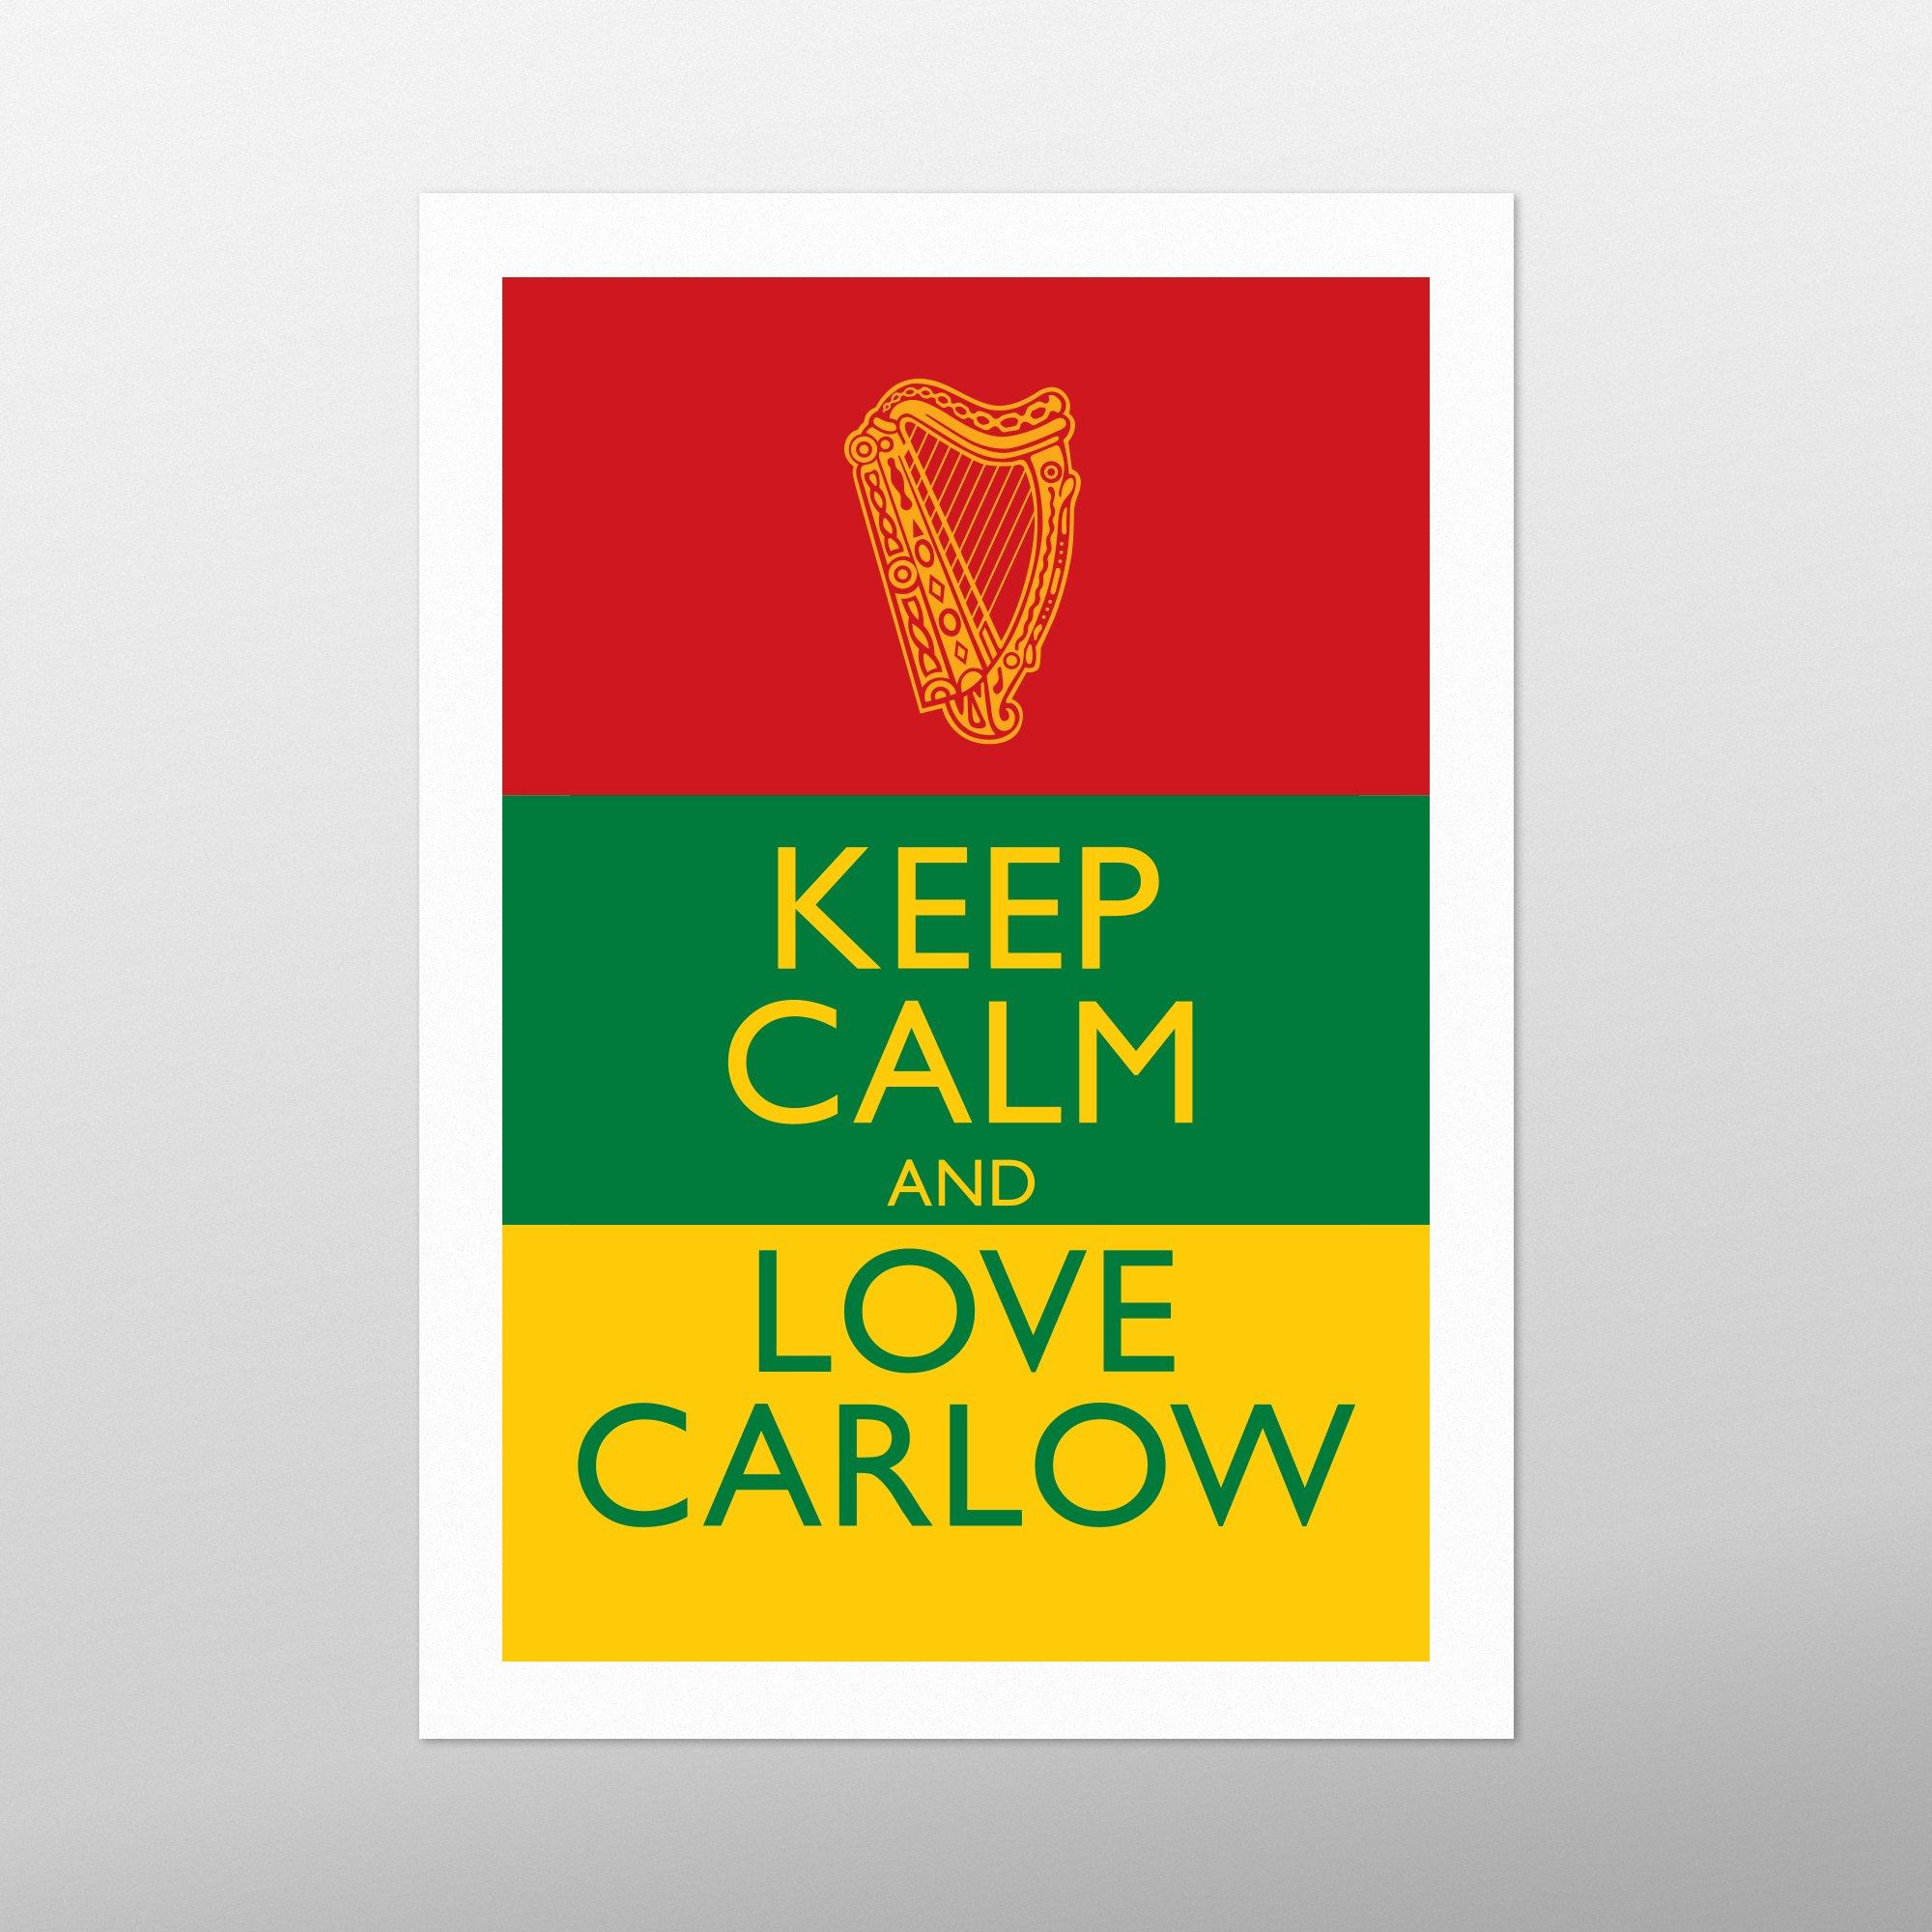 Keep Calm and Love Carlow